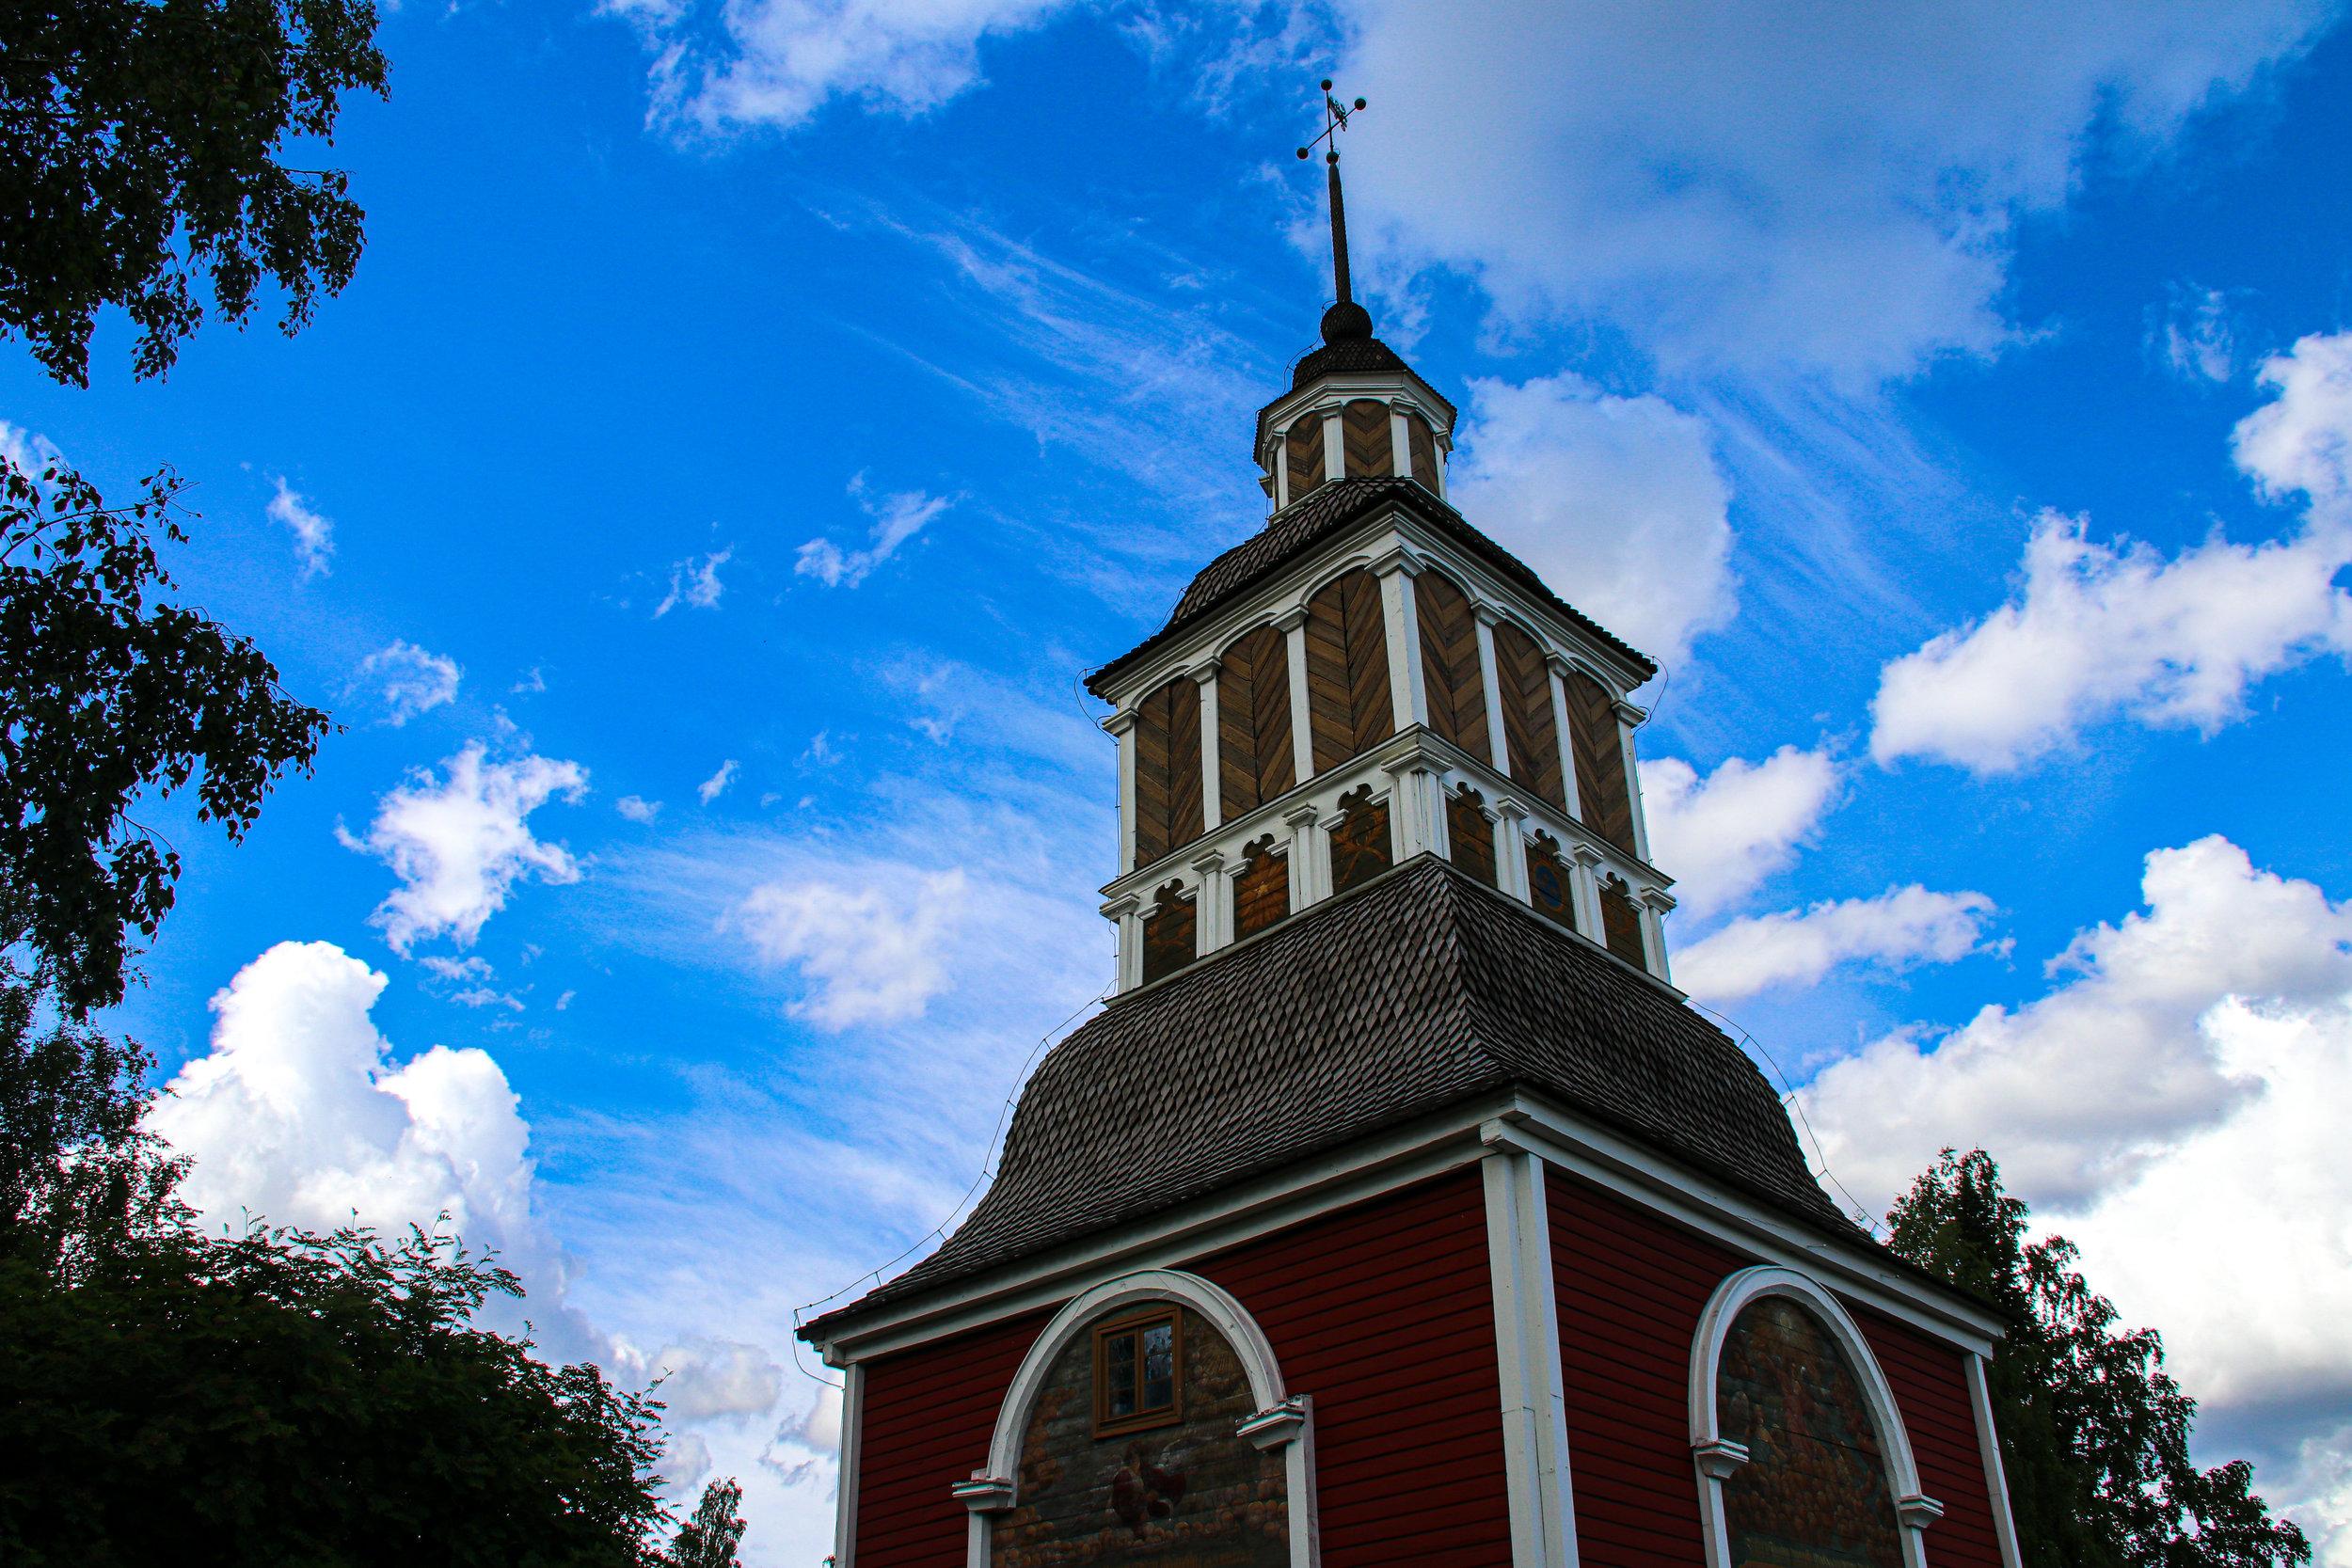 Övertorneå Kyrka Övertorneå Church